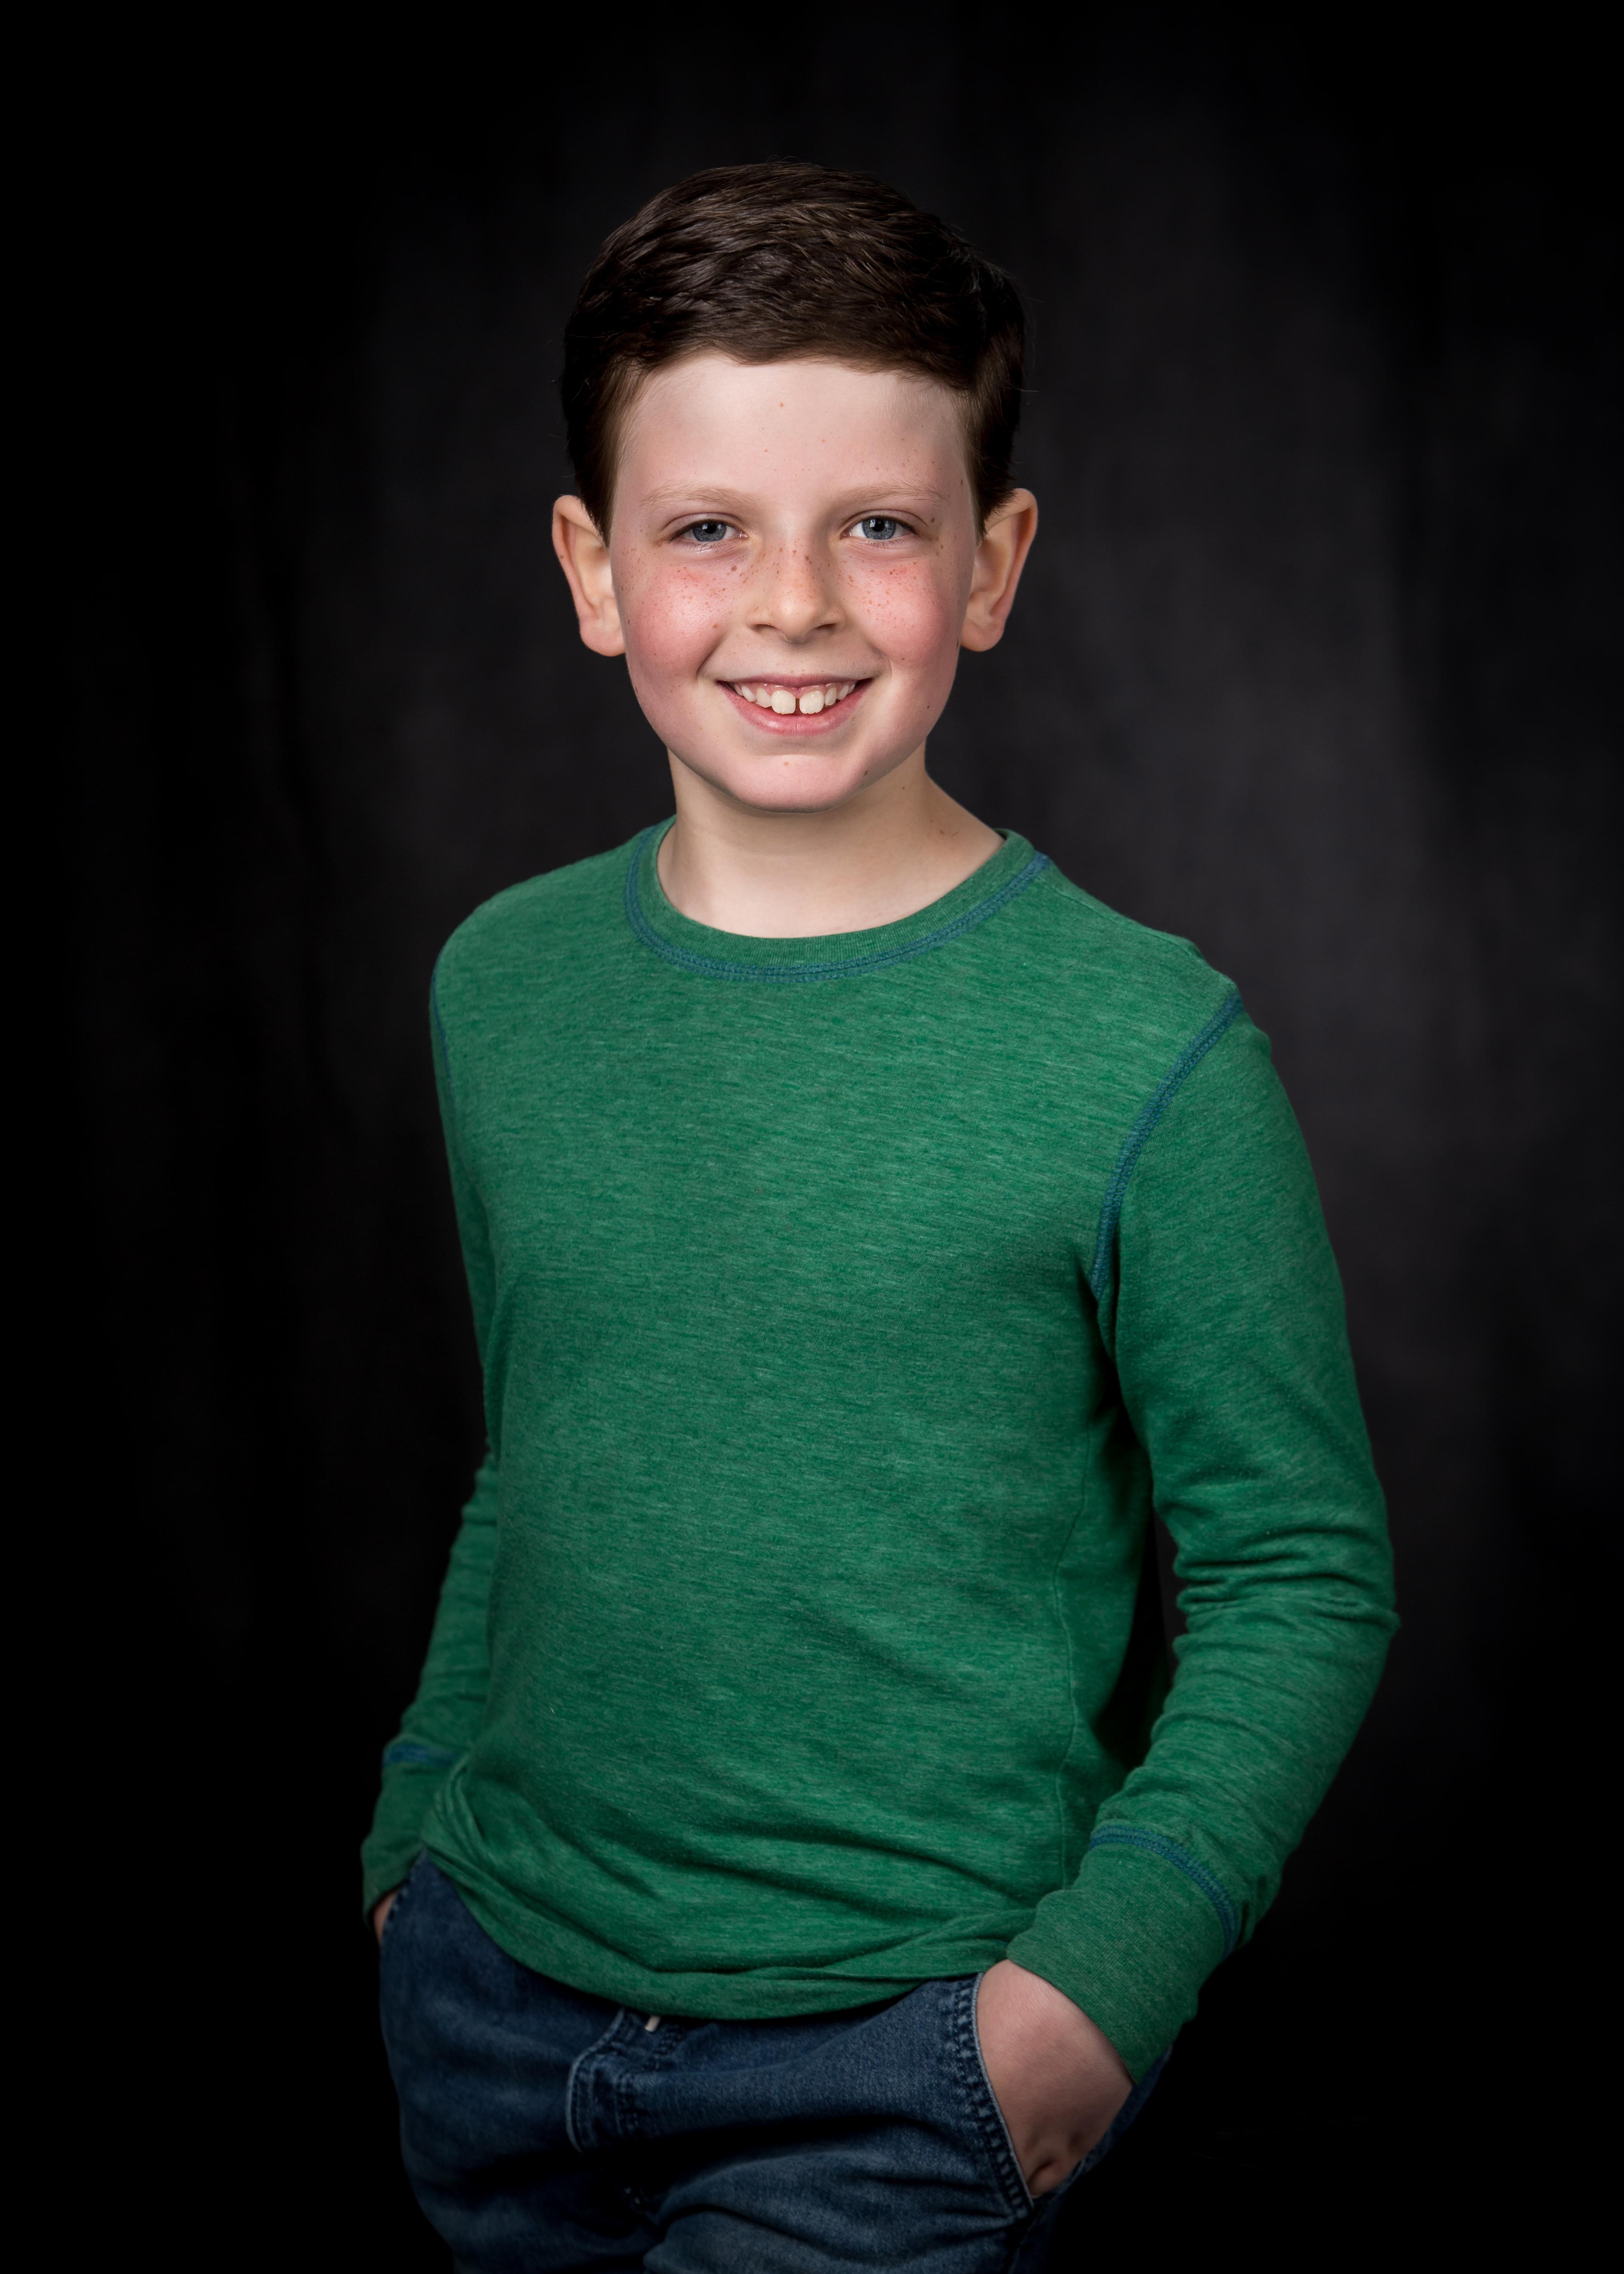 Child Actor Photos